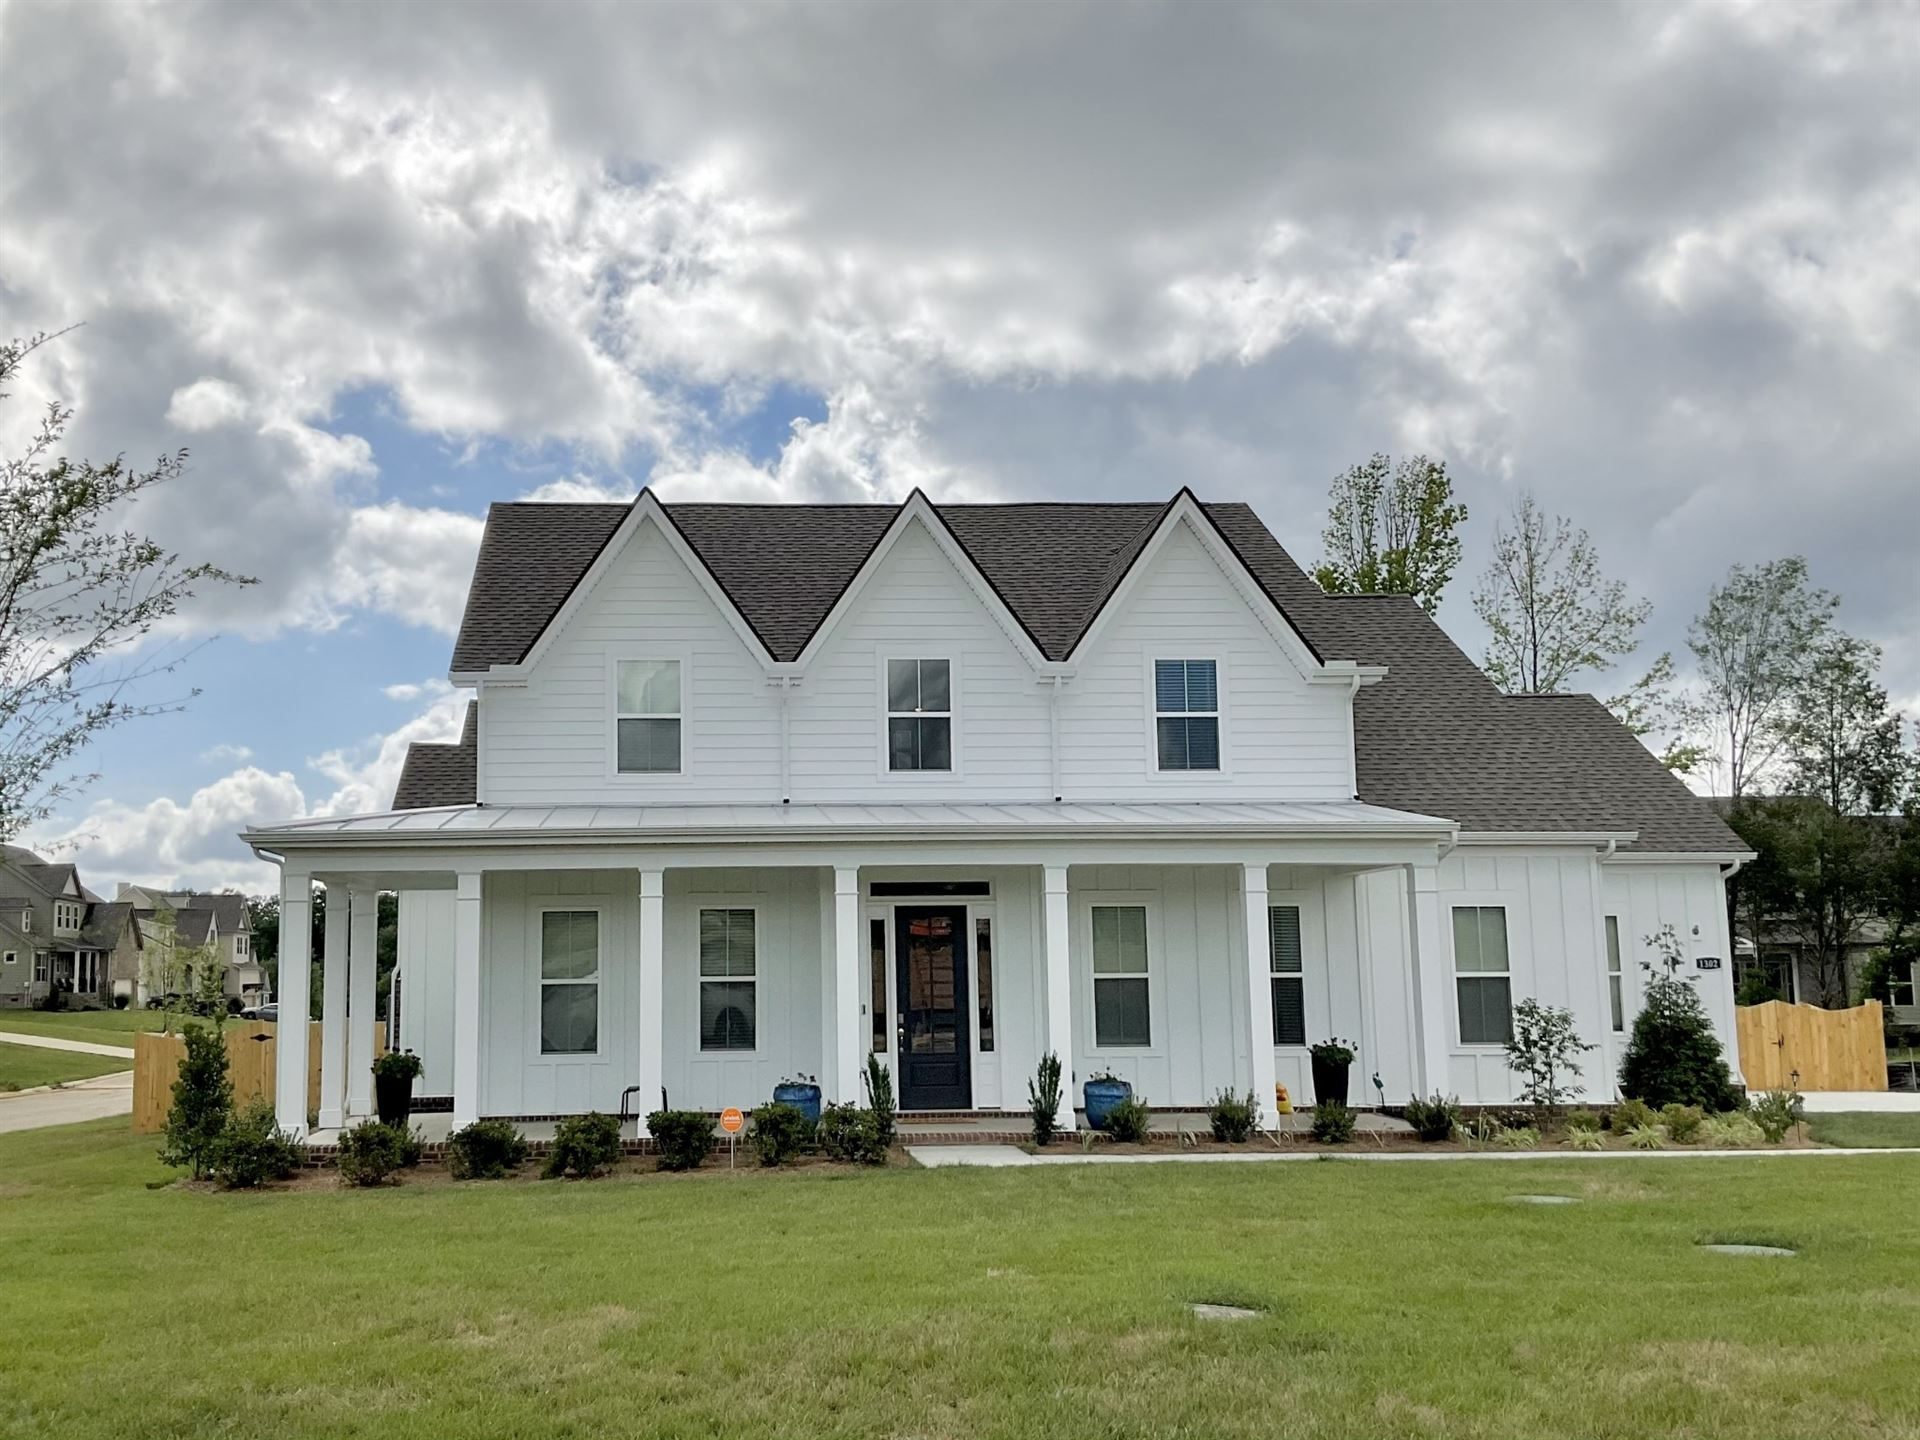 1103 Clarendon Ave, Murfreesboro, TN 37128 - MLS#: 2260513